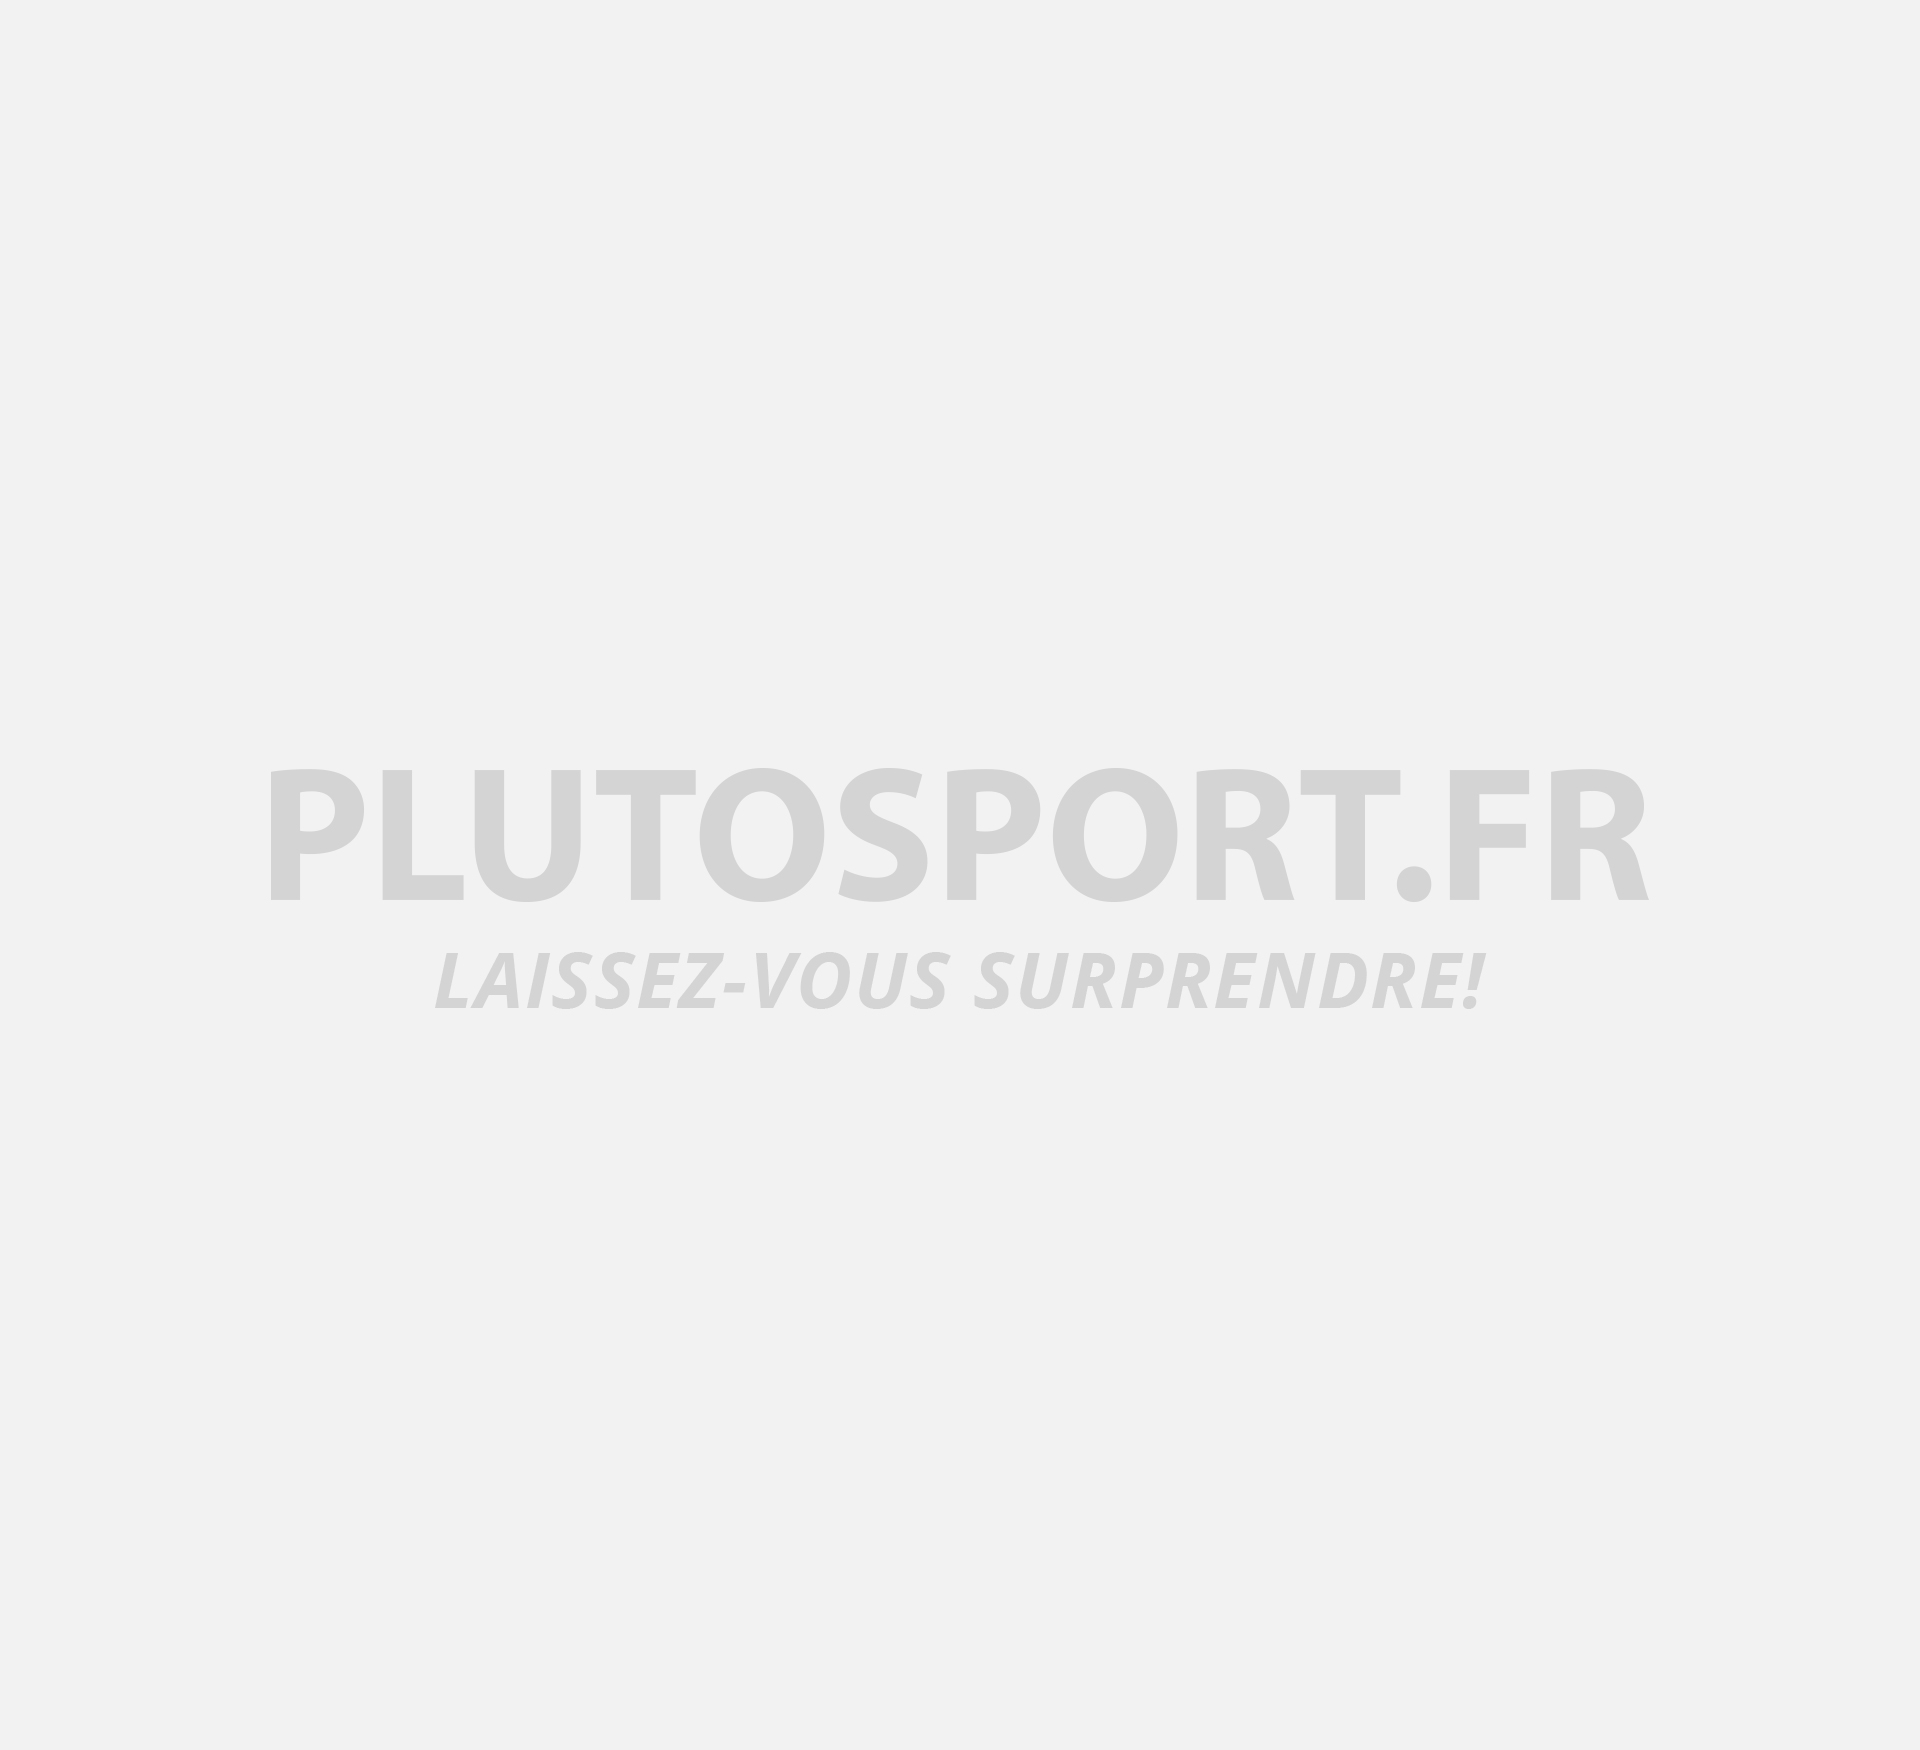 Björn Borg Shorts Summer Weekend (3pack)